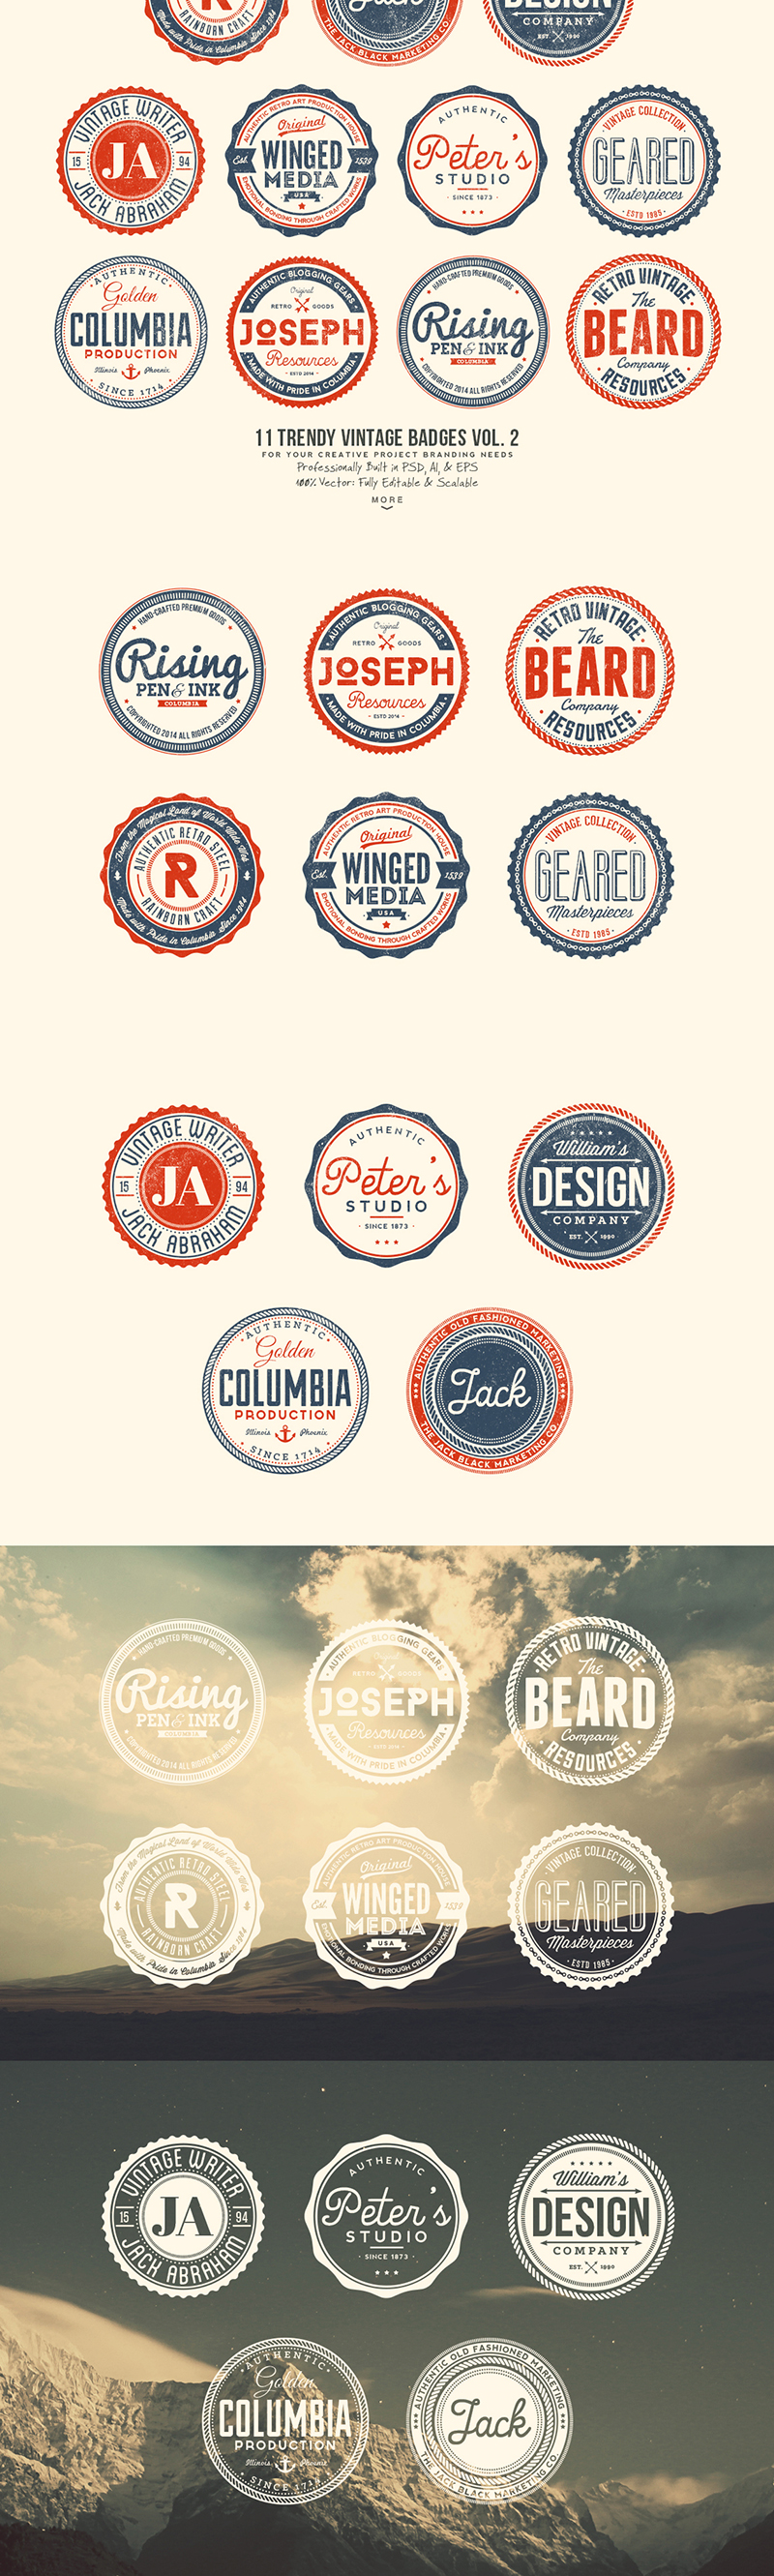 33 Trendy Vintage Badges Bundle Pack Preview 2